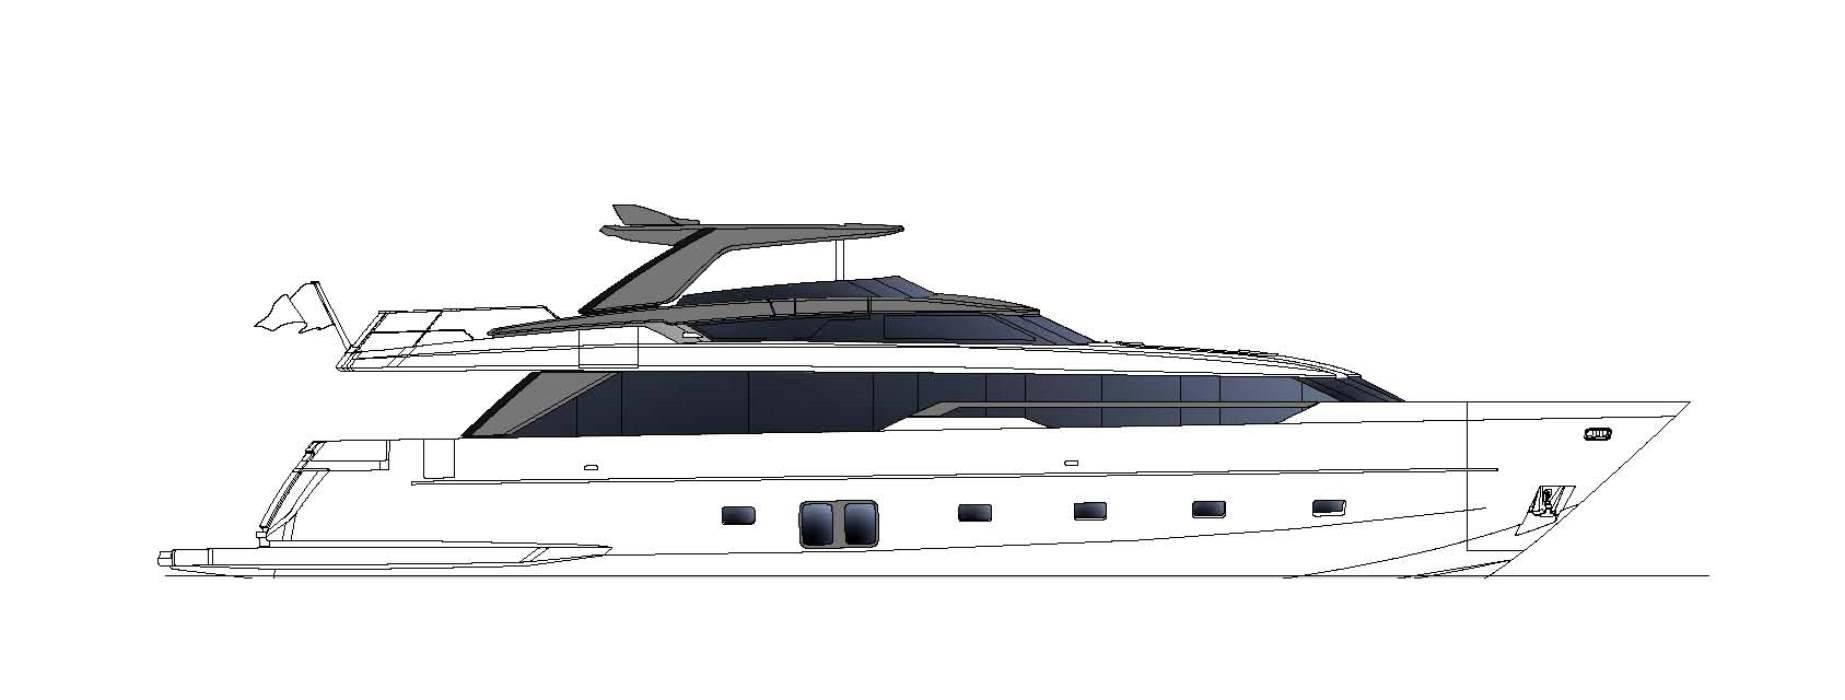 Sanlorenzo Yachts SL96 Asymmetric 外观